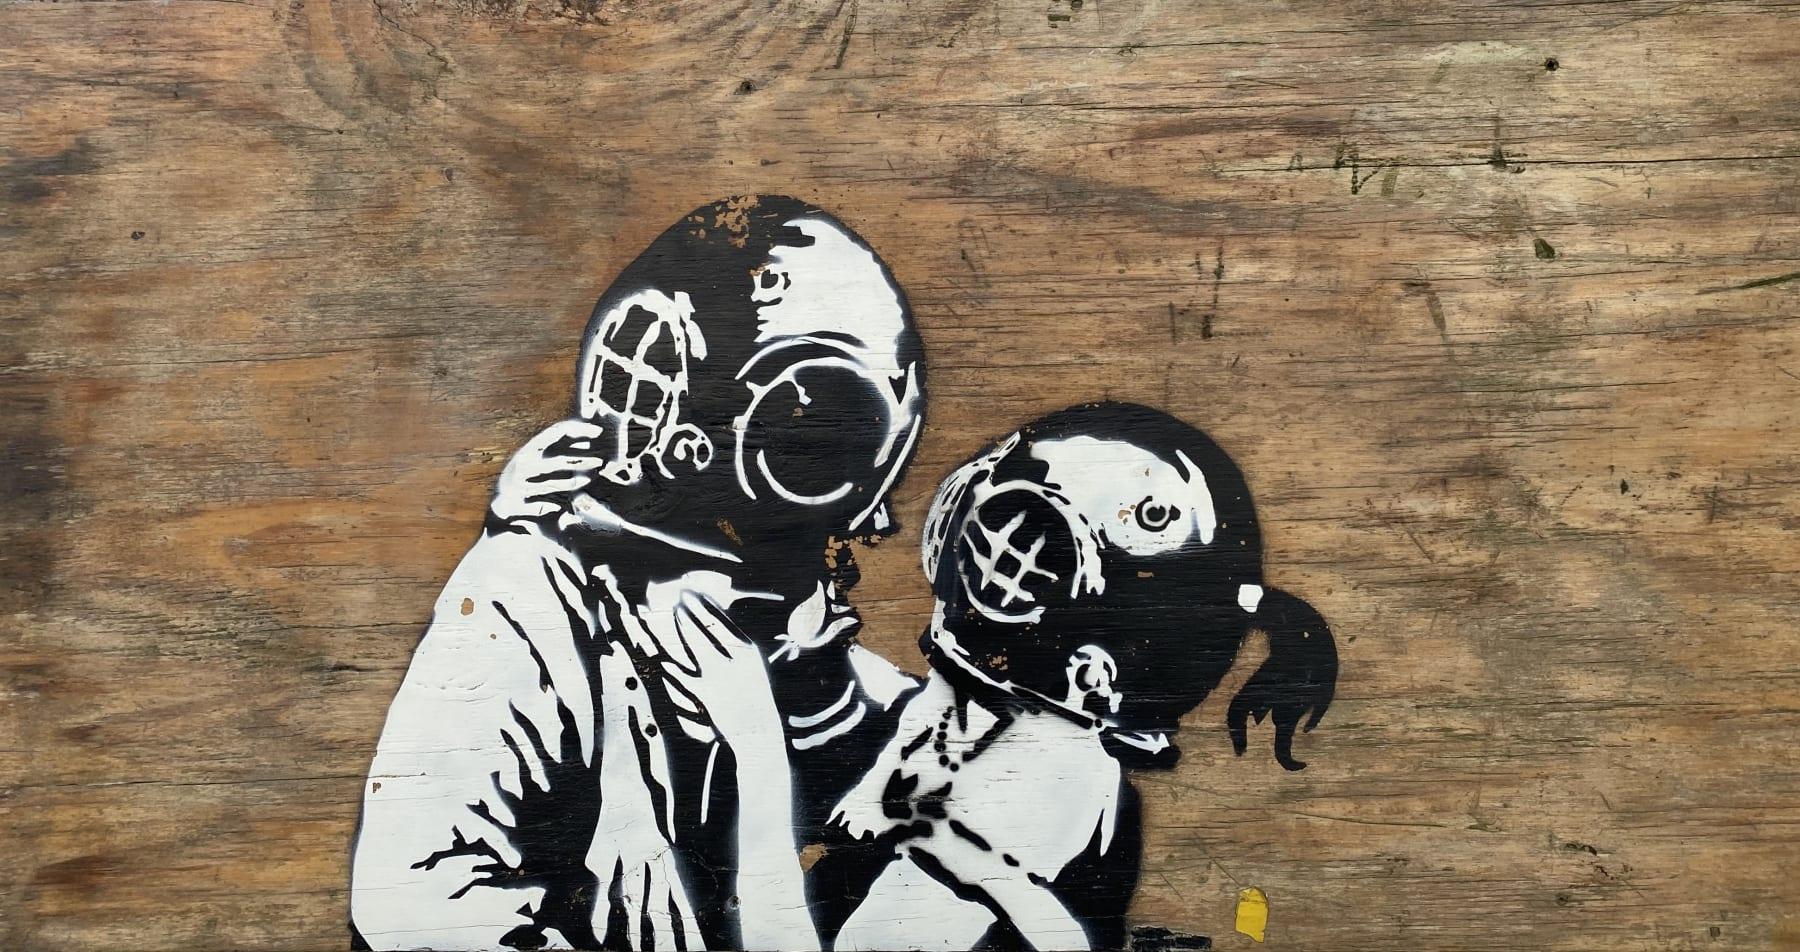 Think Tank original artwork on wooden board.